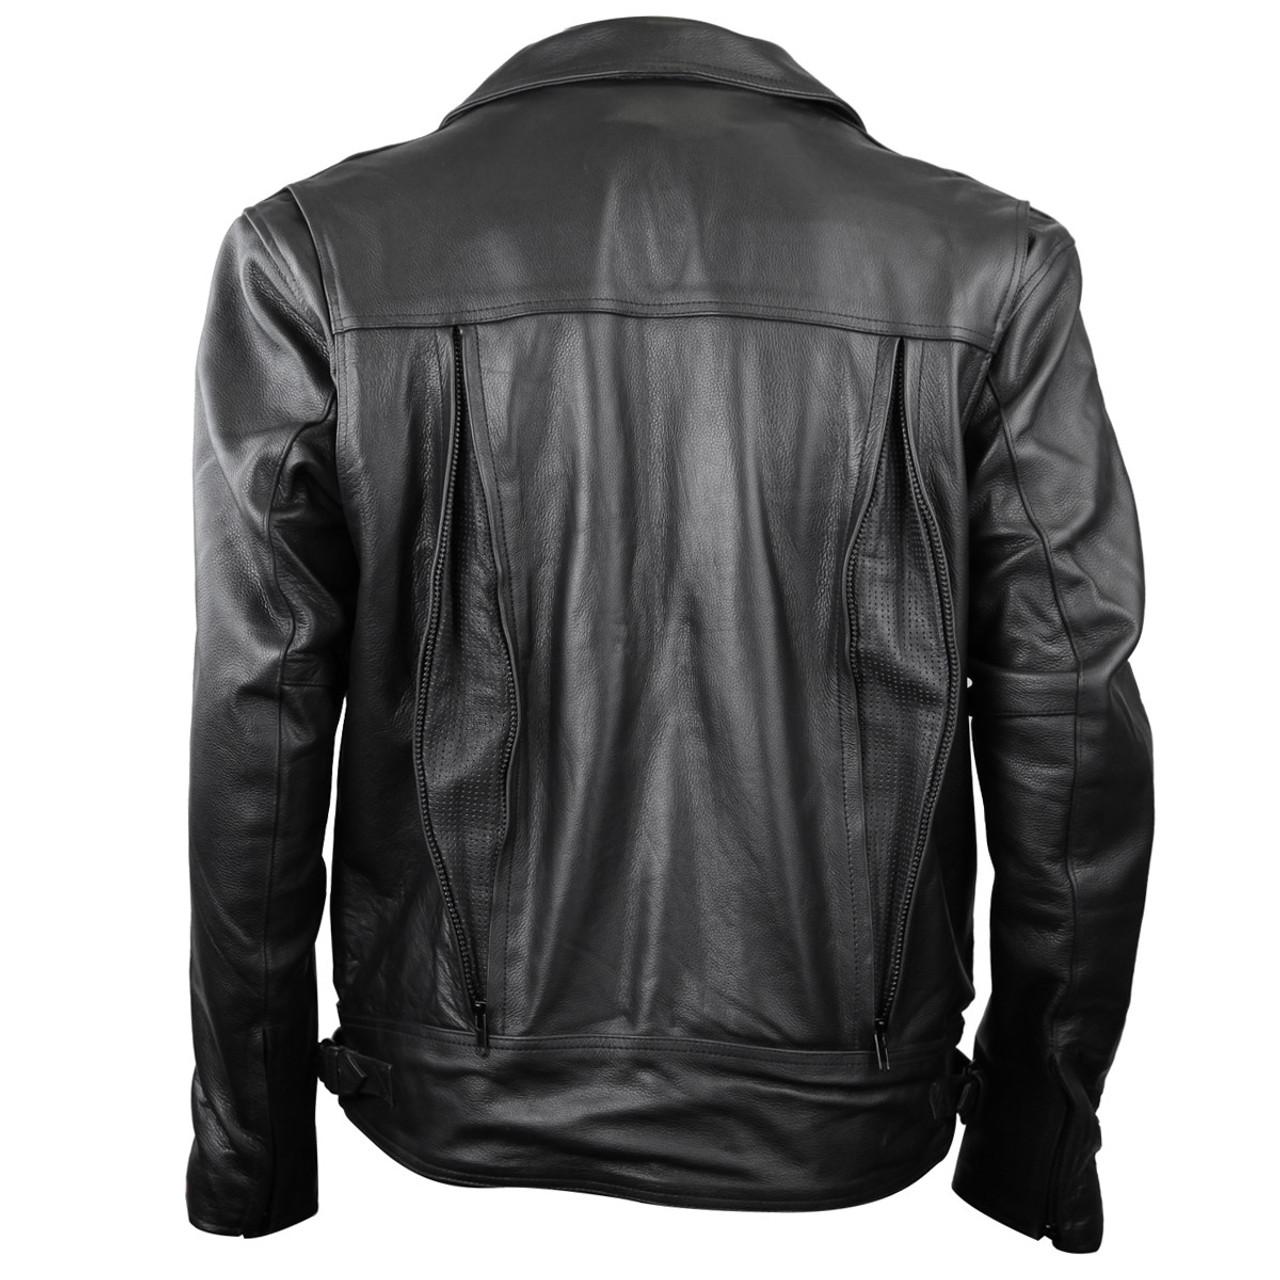 NEW Child Black Leather Vests Detour Motorcycle Gear